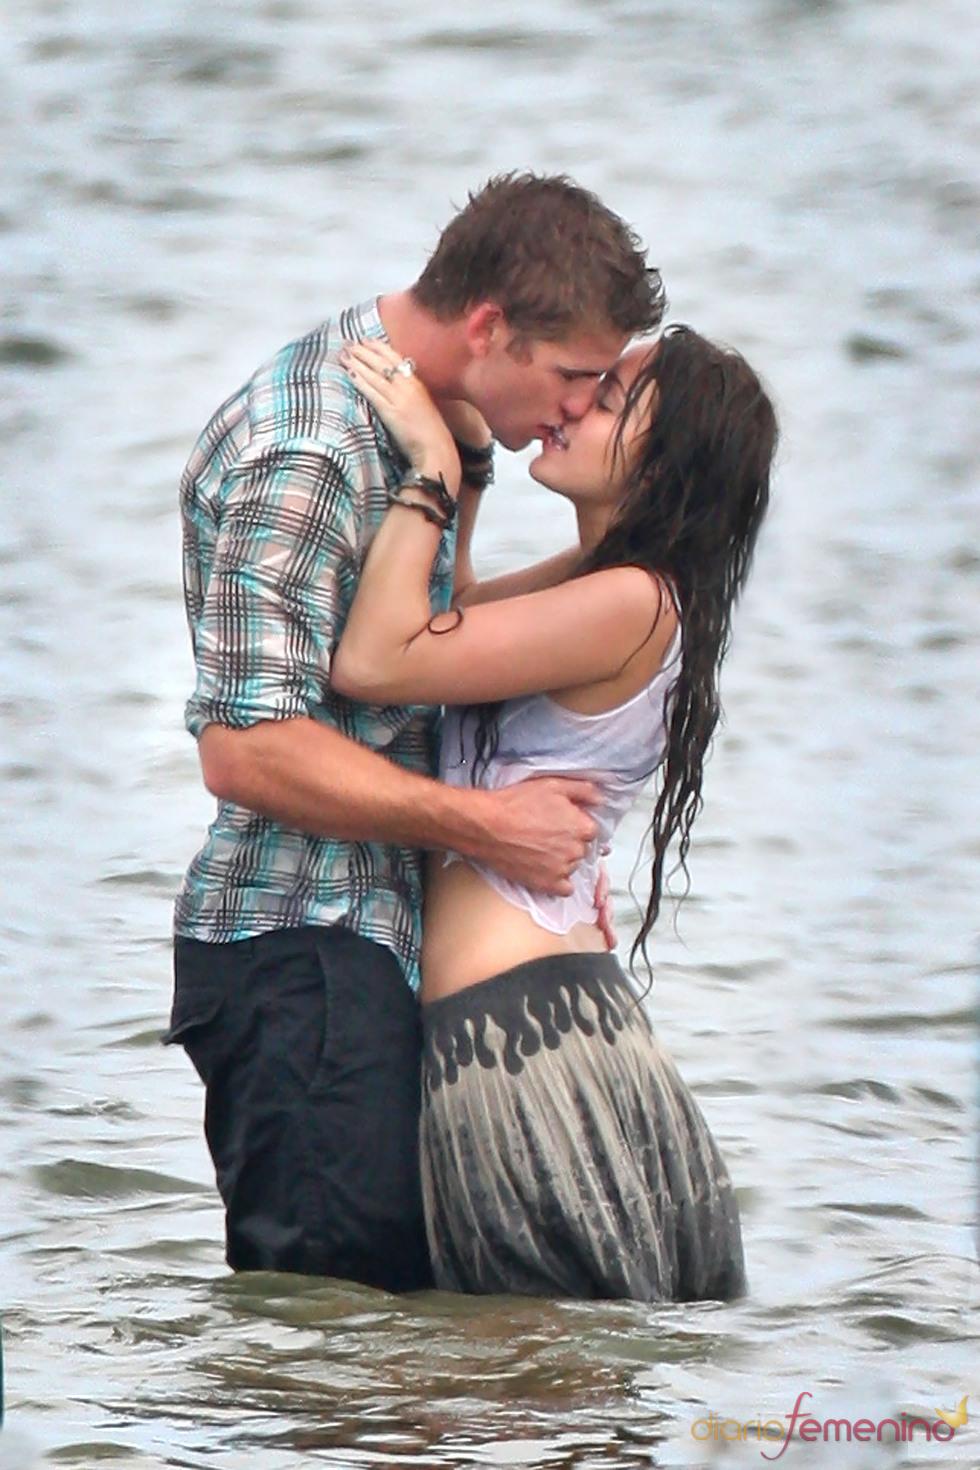 Miley Cyrus y Liam Hemsworth se besan